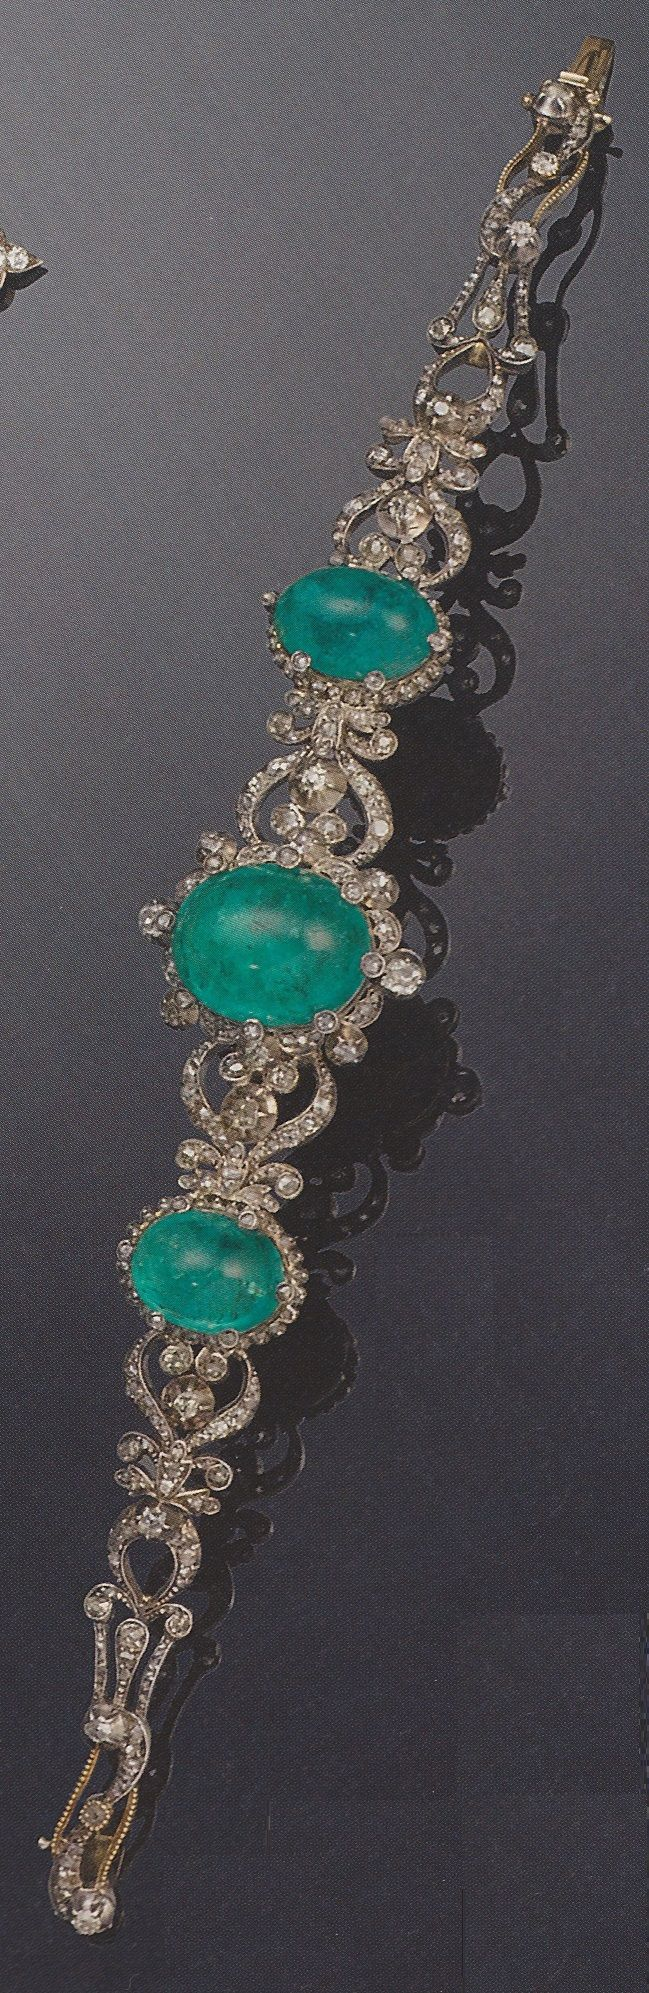 An antique diamond and emerald bracelet, 19th century. Provenance: Princess Hanna of Liechtenstein (1849-1925). Source: Signature Styles: Fine Jewellery and Iconic Jewels from the 20th century. Bonhams, 6 December 2007, London.